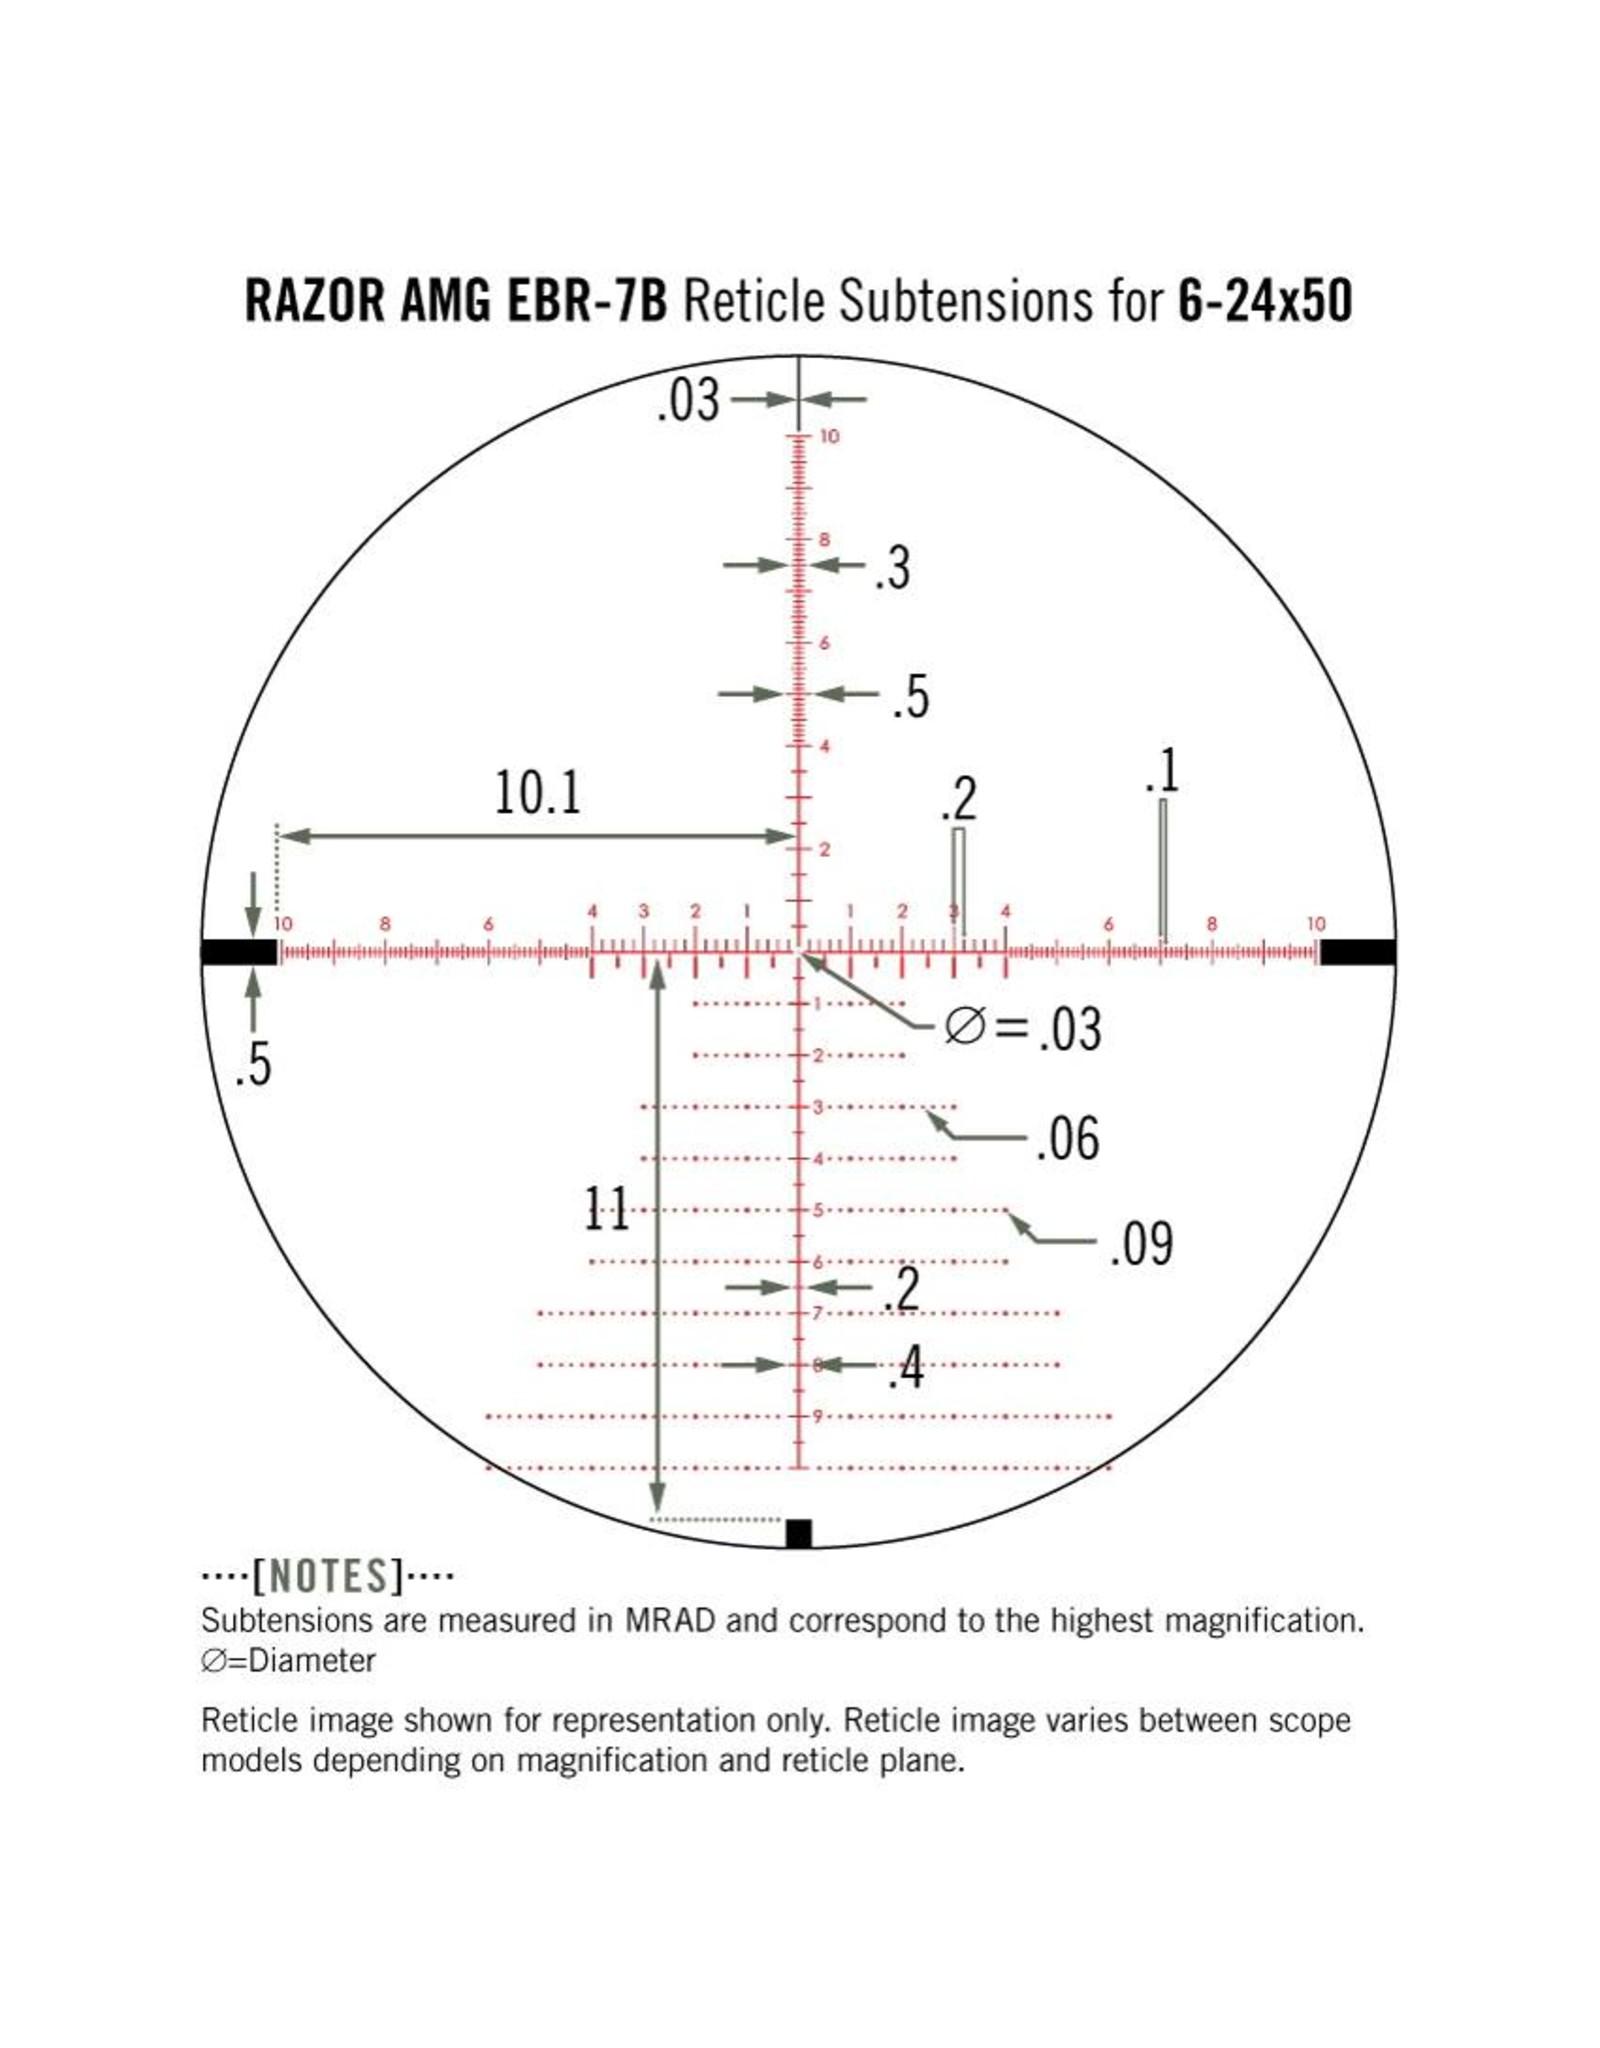 Vortex Razor HD AMG 6-24x50 FFP Riflescope with EBR-7B mrad Reticle